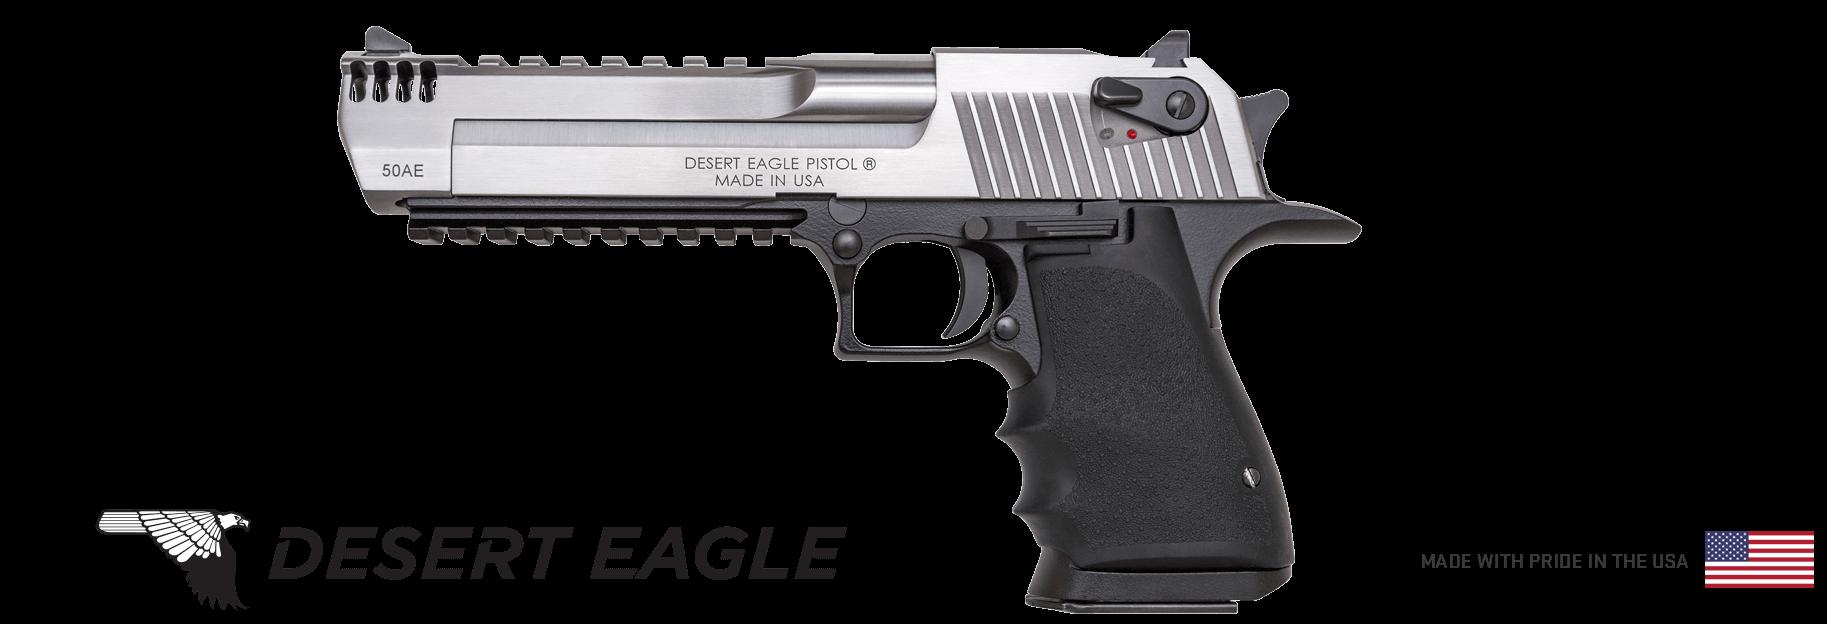 Desert Eagle L6 L5 - Magnum Research, Inc  | Desert Eagle pistols